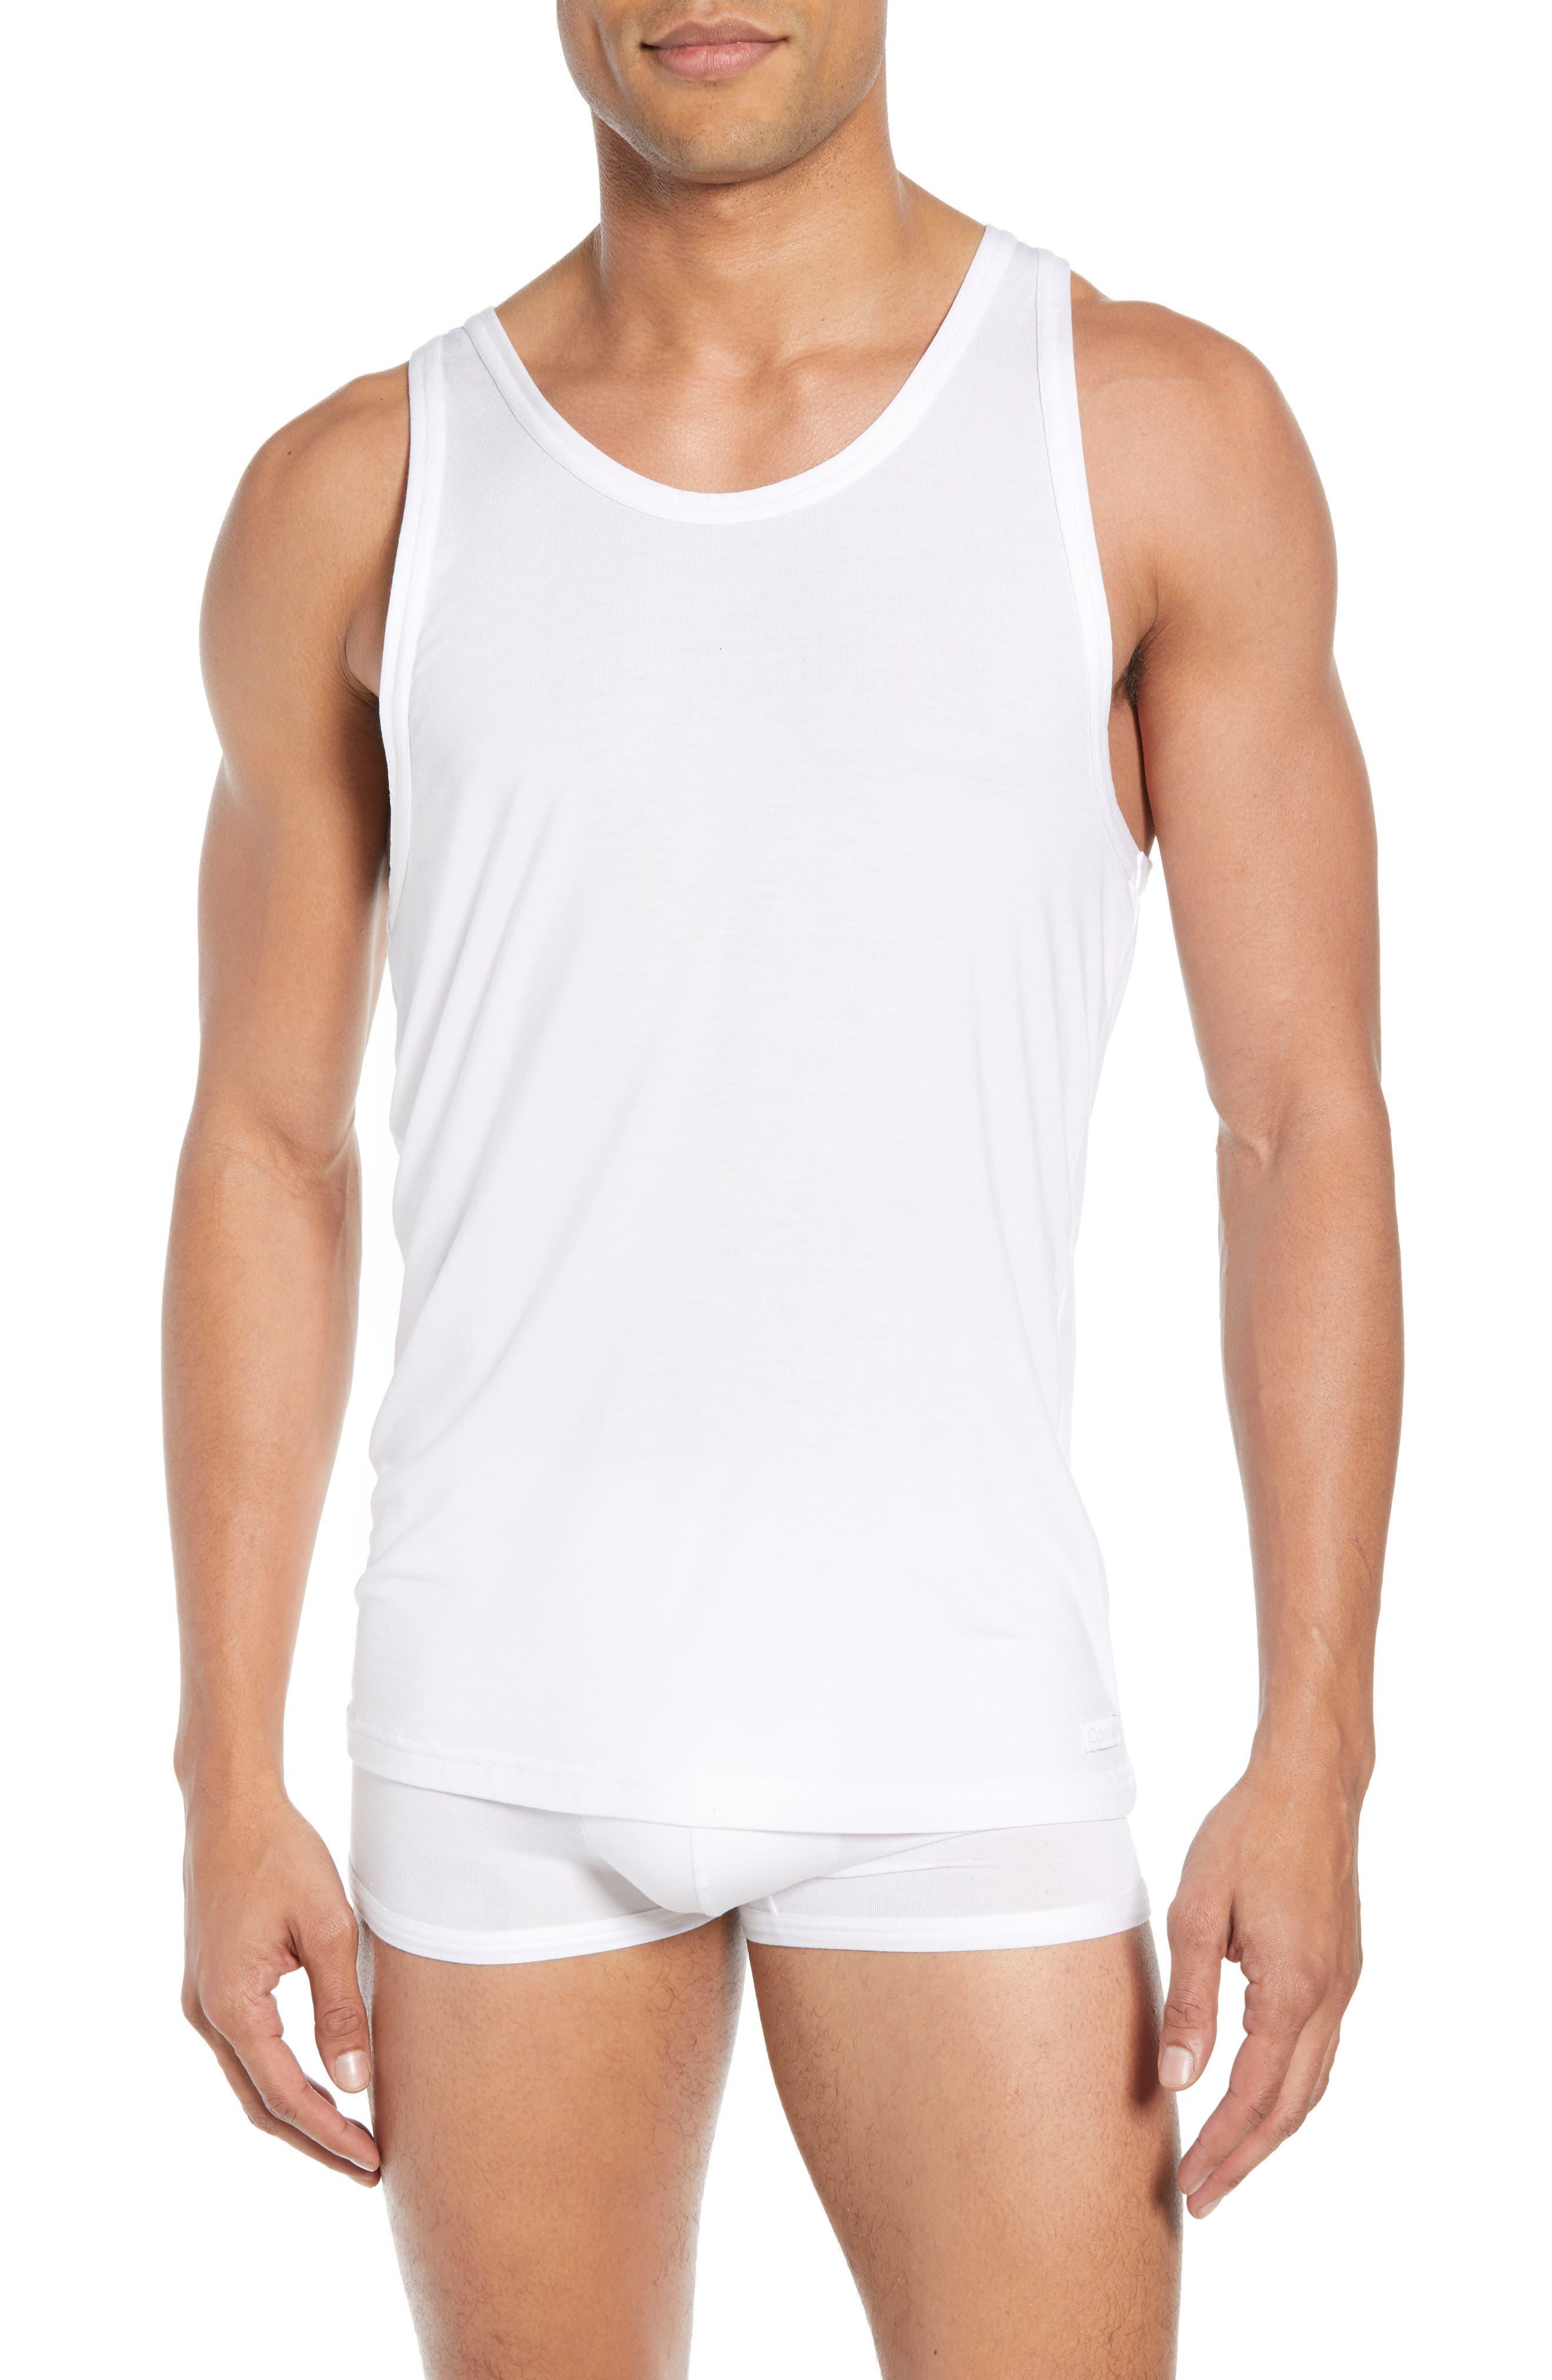 ab8519725d20c6 Men s Calvin Klein Undershirts